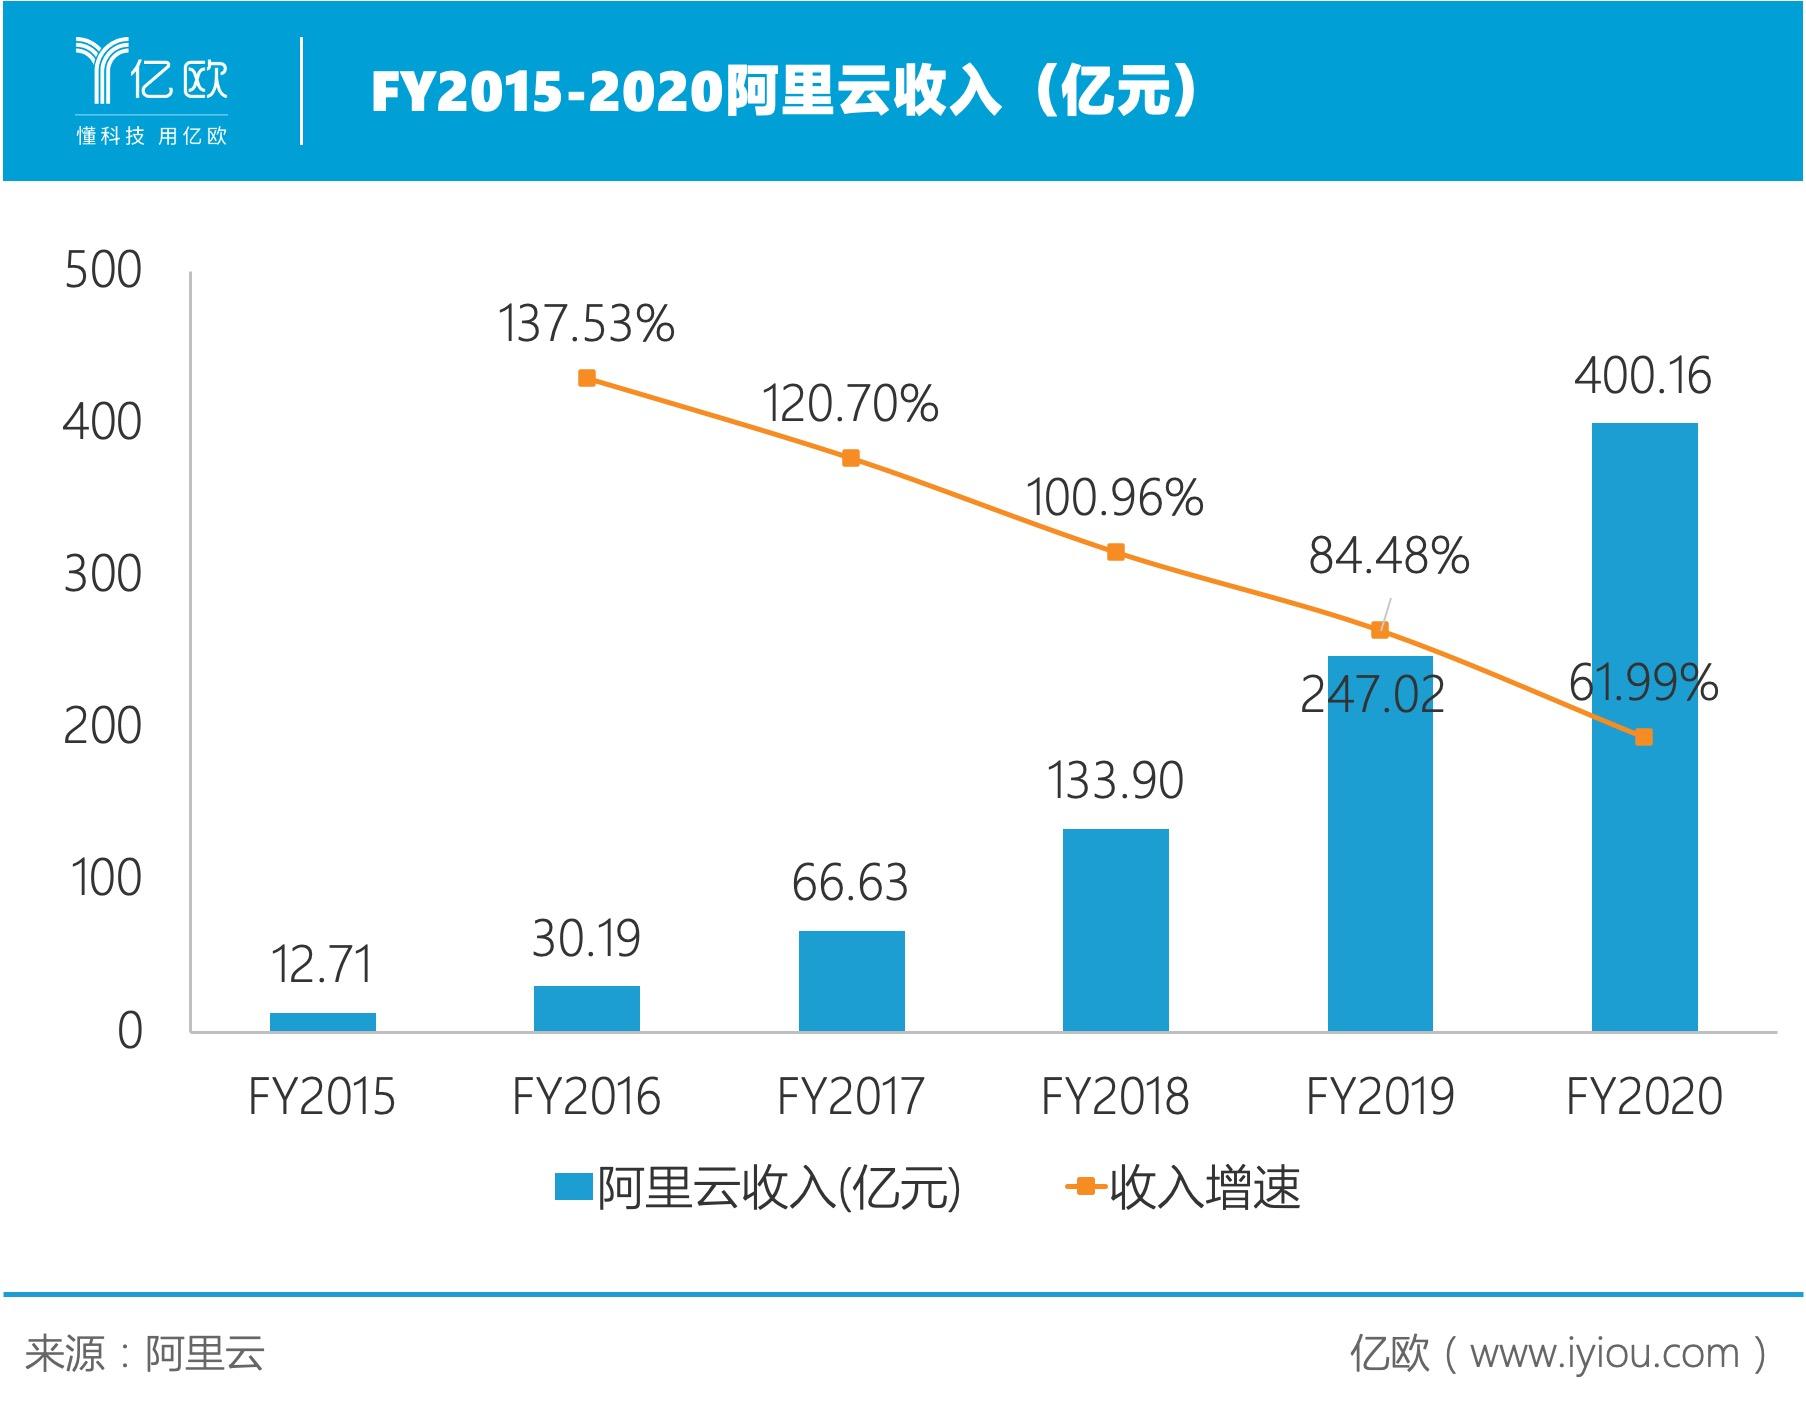 FY2015-2020阿里云收入(亿元)。jpg.jpg